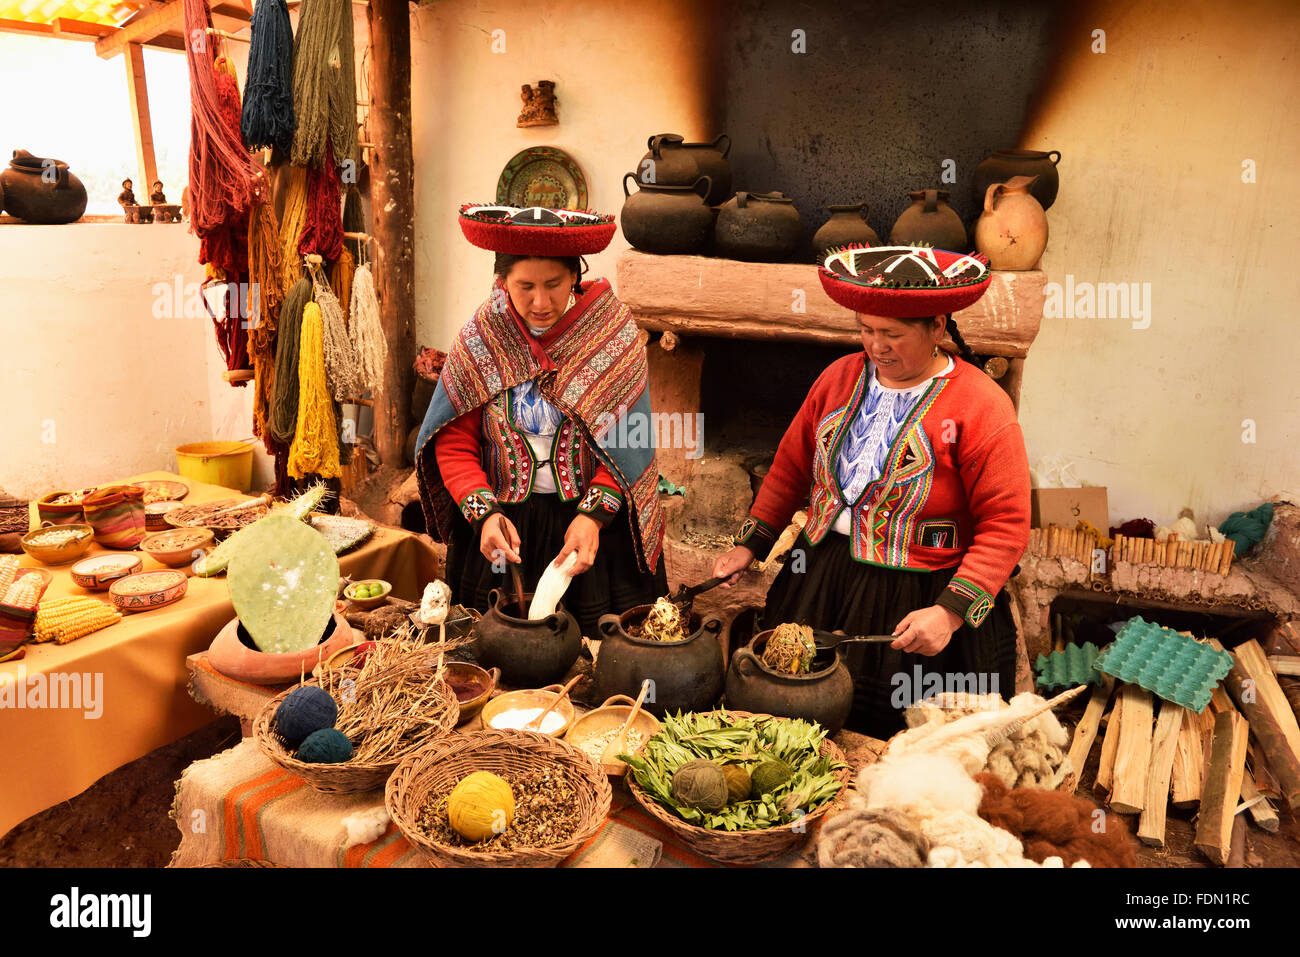 Two Peruvians, traditional alpaca wool dyeing, Chinchero, Cusco Province, Peru - Stock Image